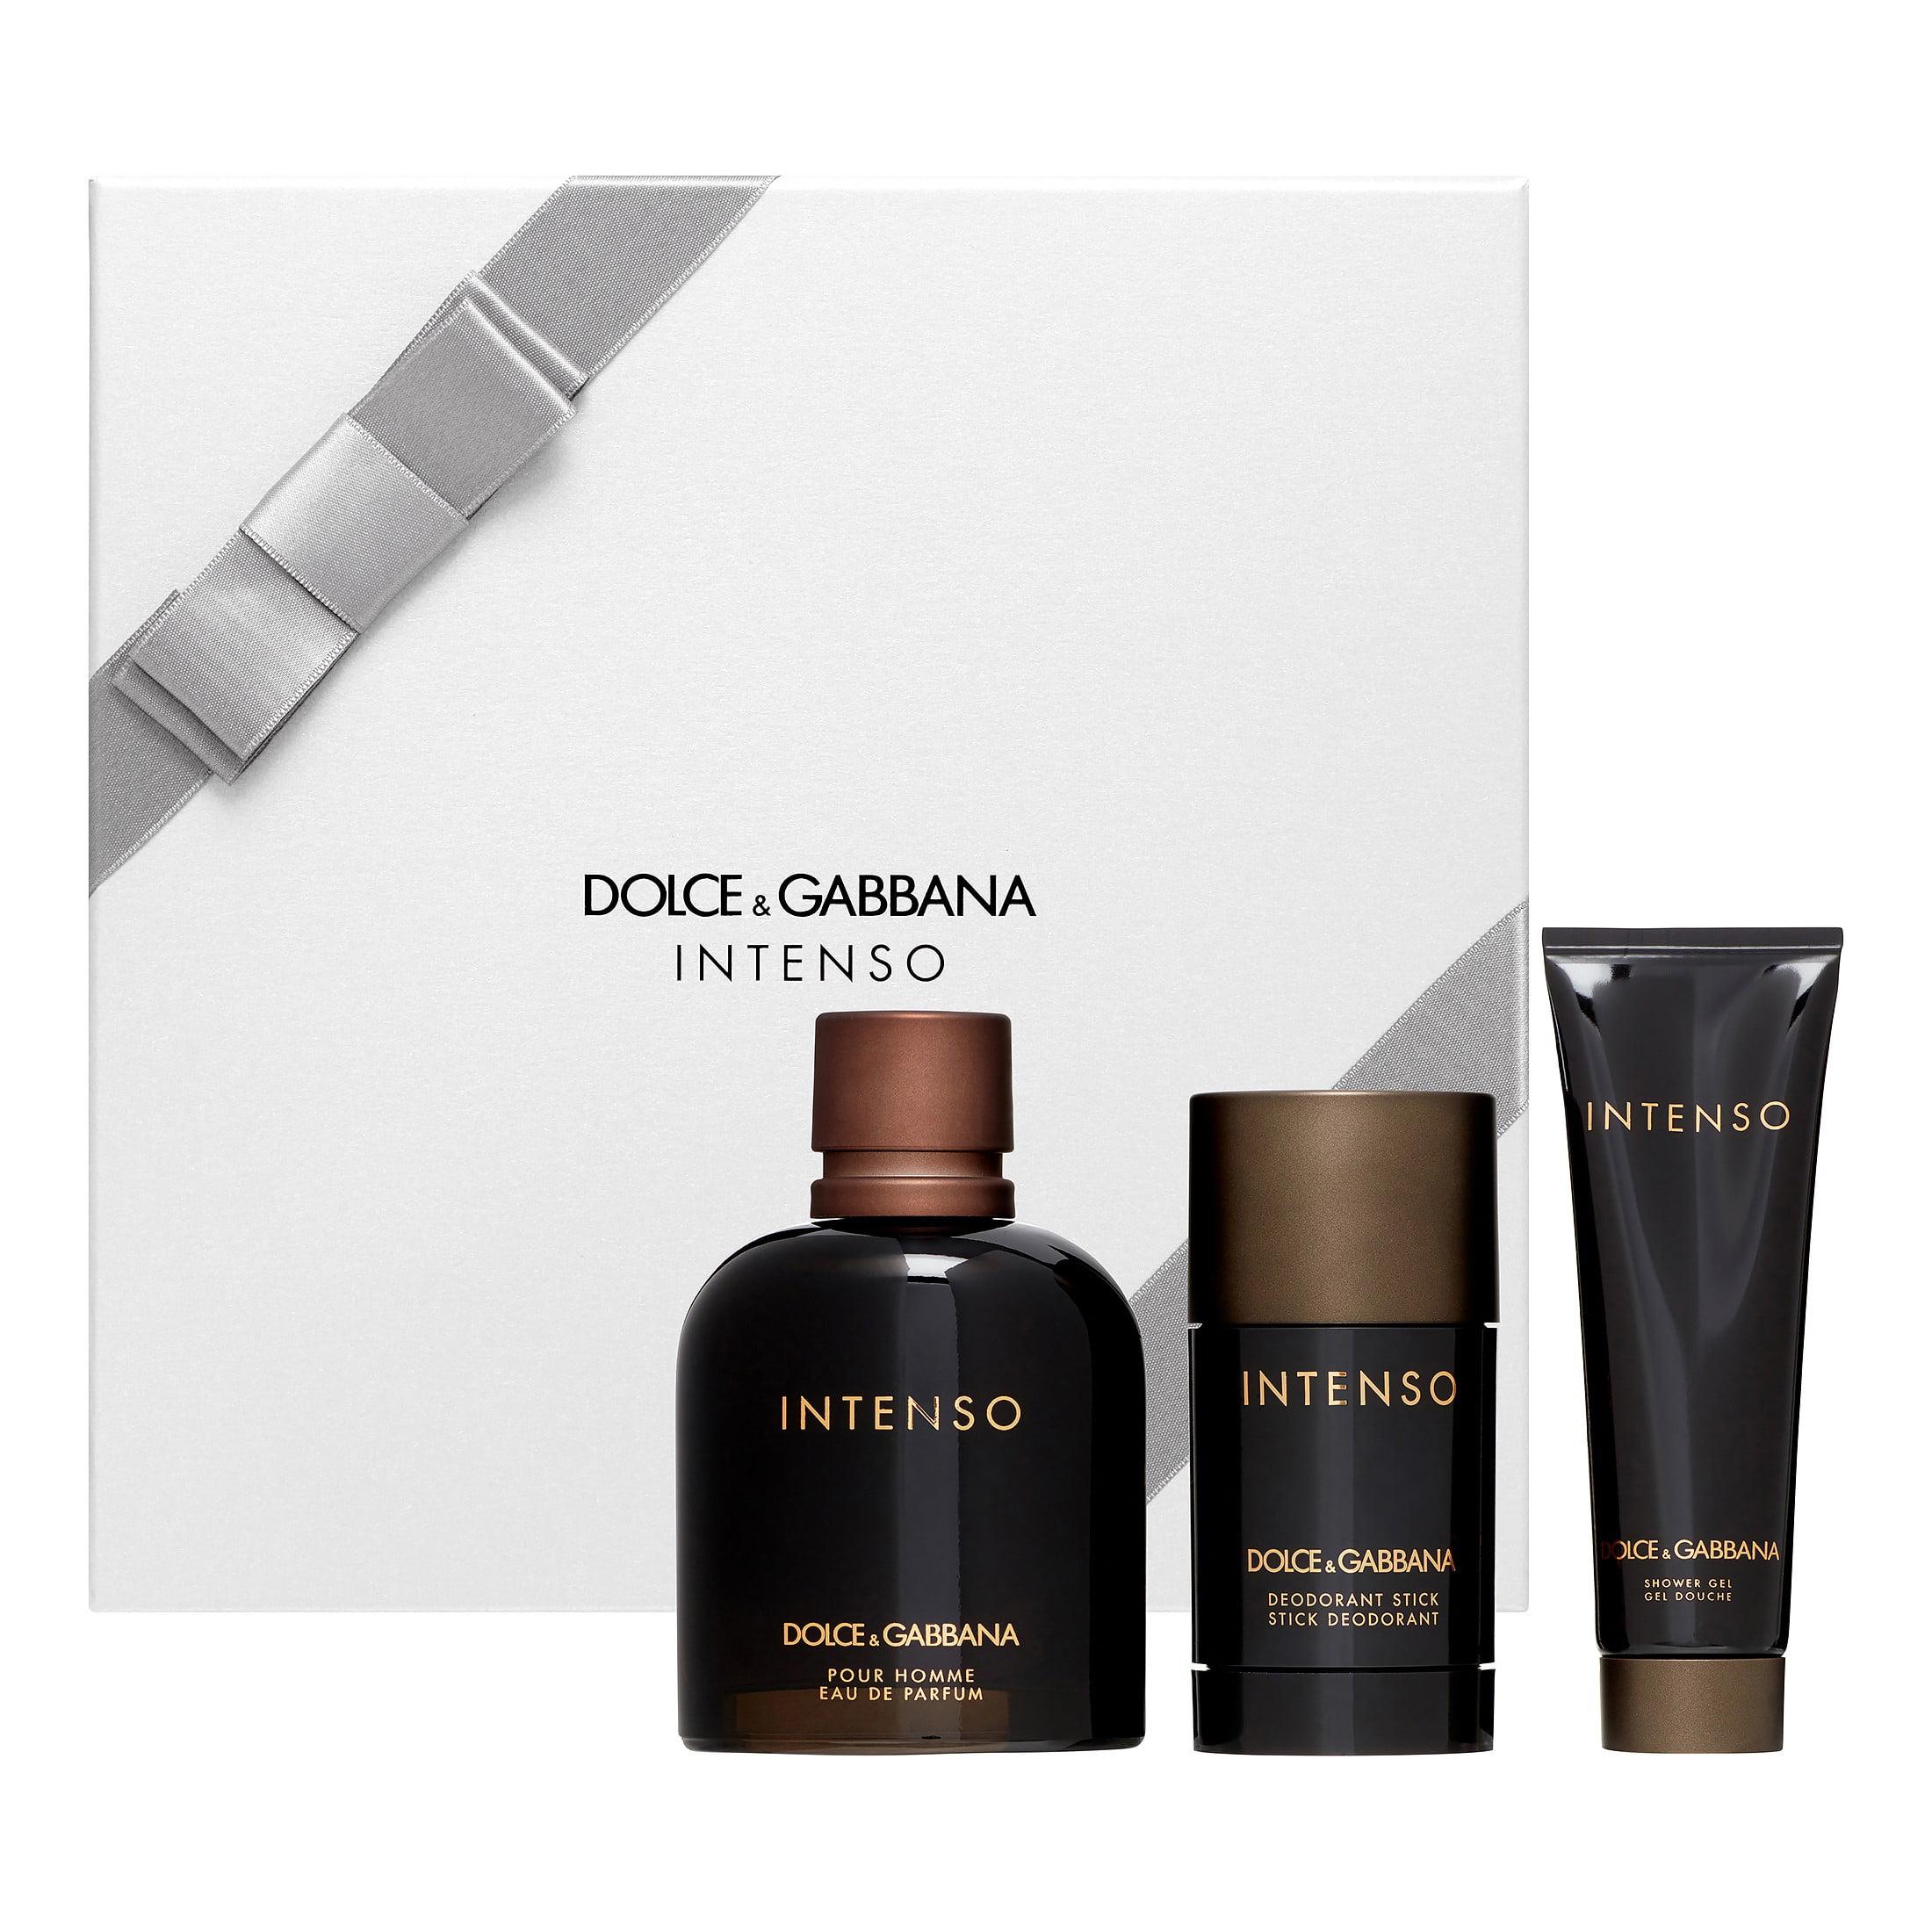 Dolce & Gabbana Intenso by Dolce & Gabbana for Men 3 Pc Gift Set 4.2oz EDP Spray, 1.6oz Shower Gel, 2.4oz Deodorant Stick